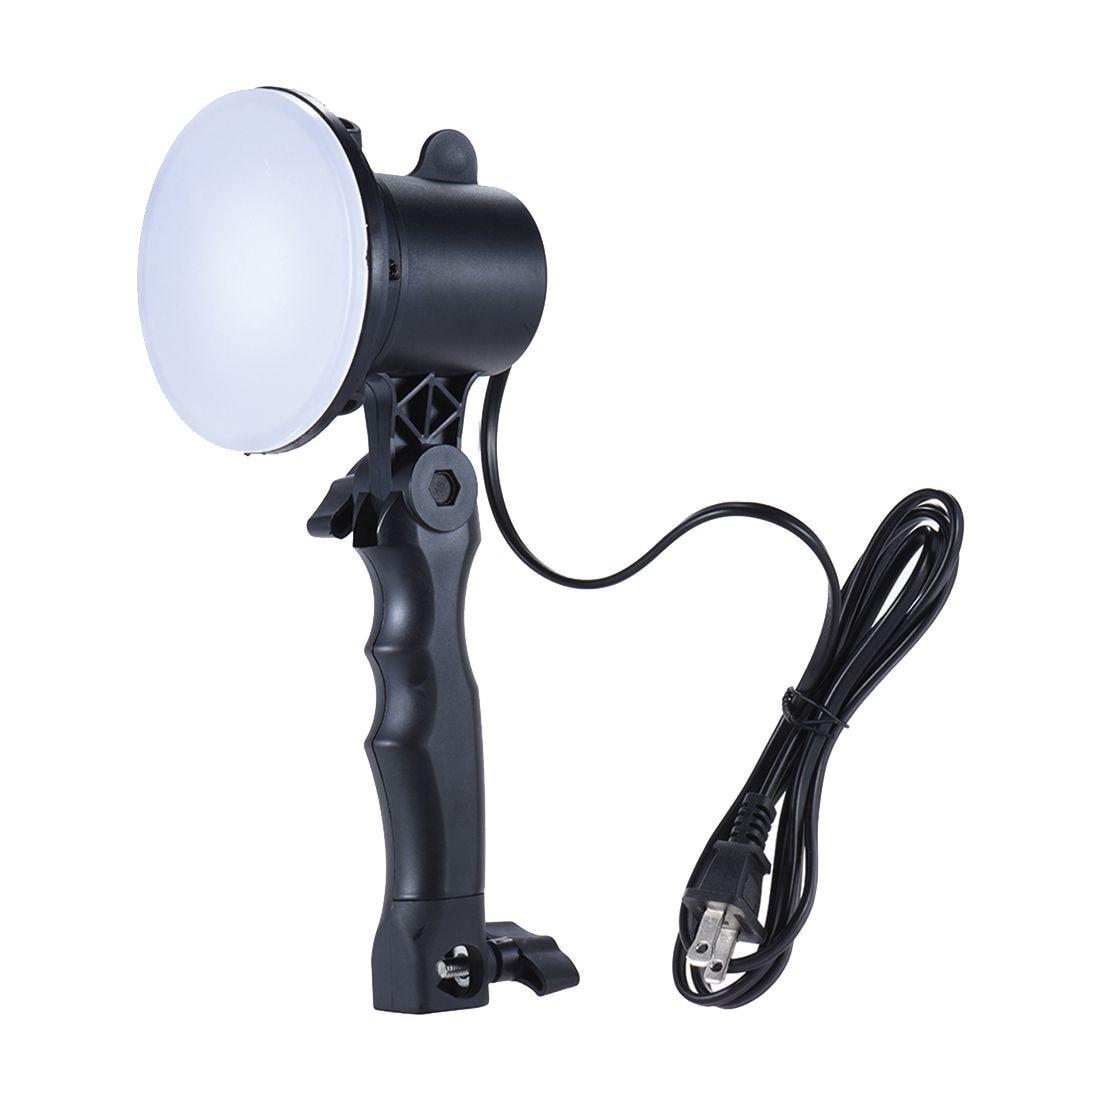 Camera/video Bags Roadfisher Photography Dslr Camera Video Led Spot Light Lamp White Warm Soft Light For Small Item Studio Shooting Live Broadcast